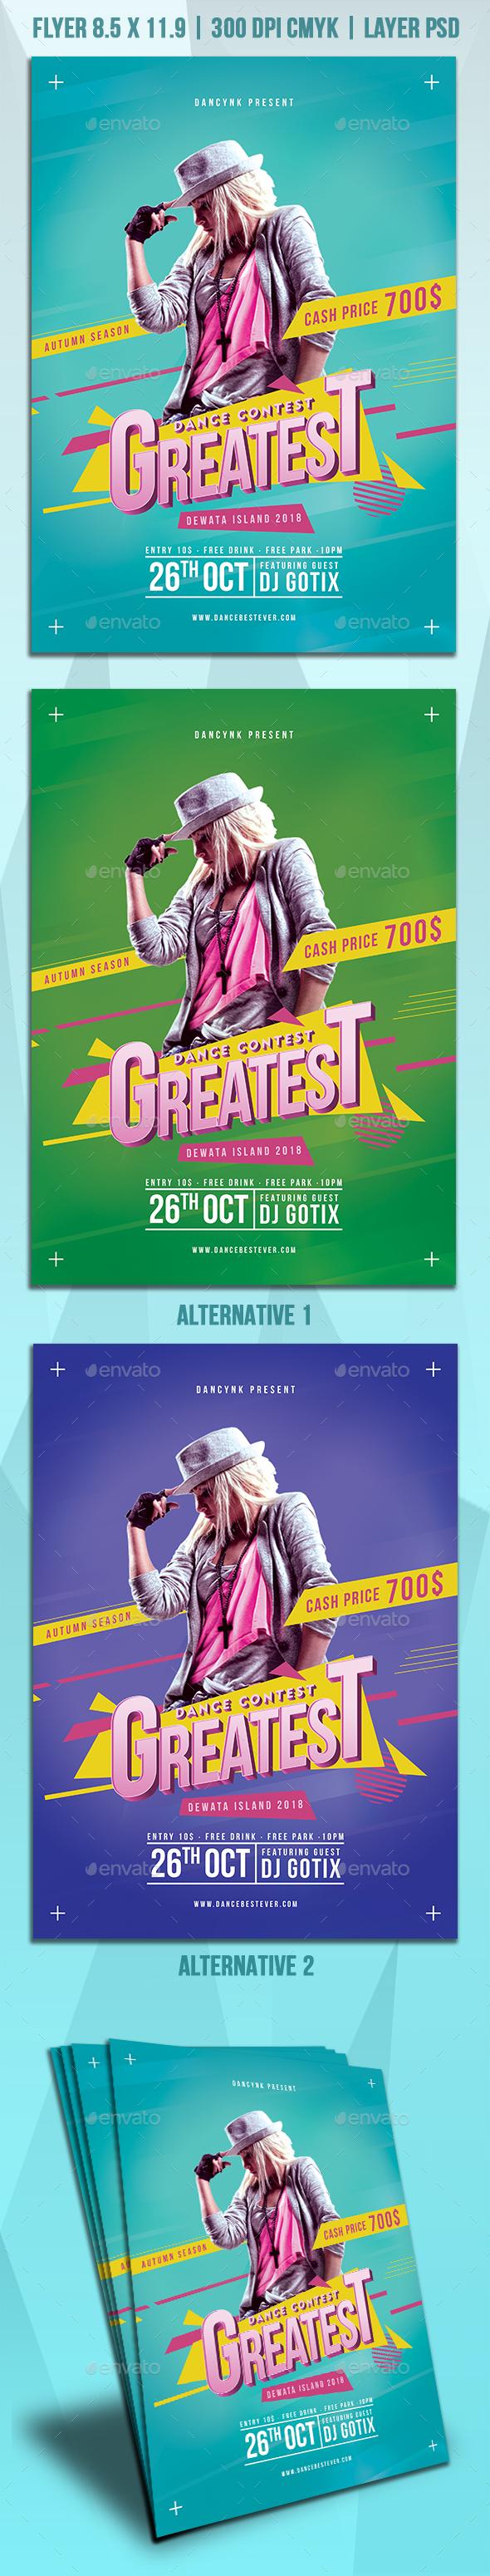 Dance Contest Flyer - Clubs & Parties Events